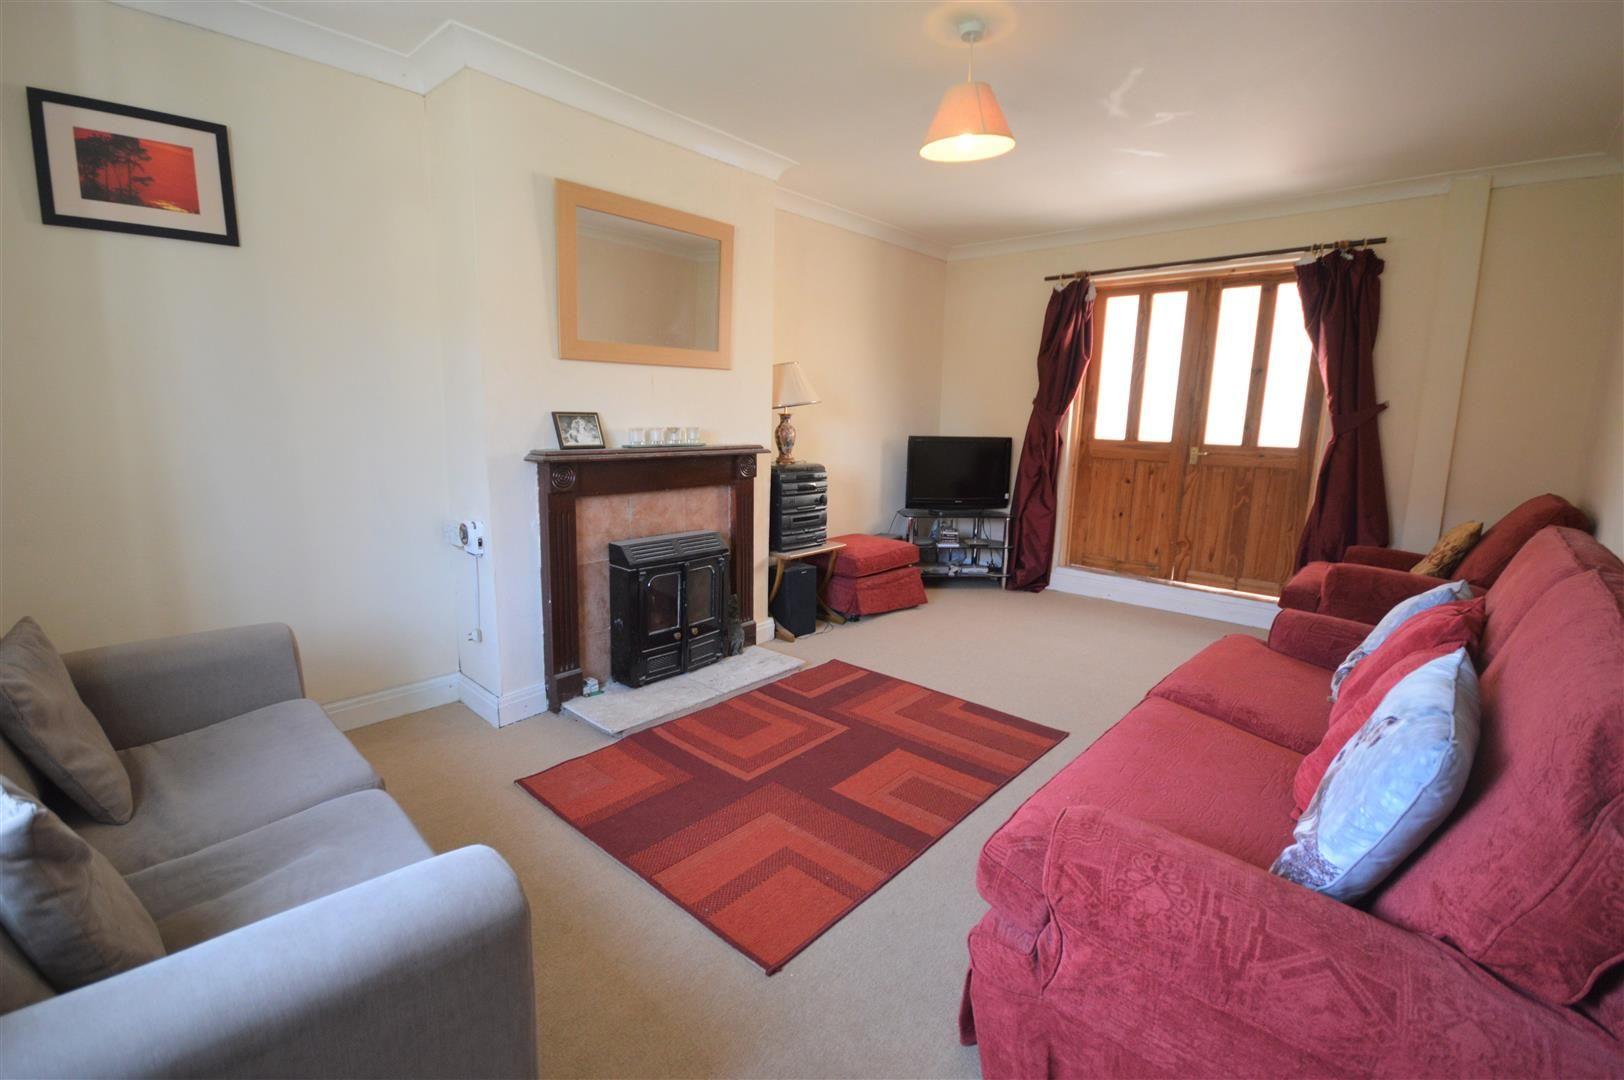 4 bed semi-detached for sale in Presteigne  - Property Image 3